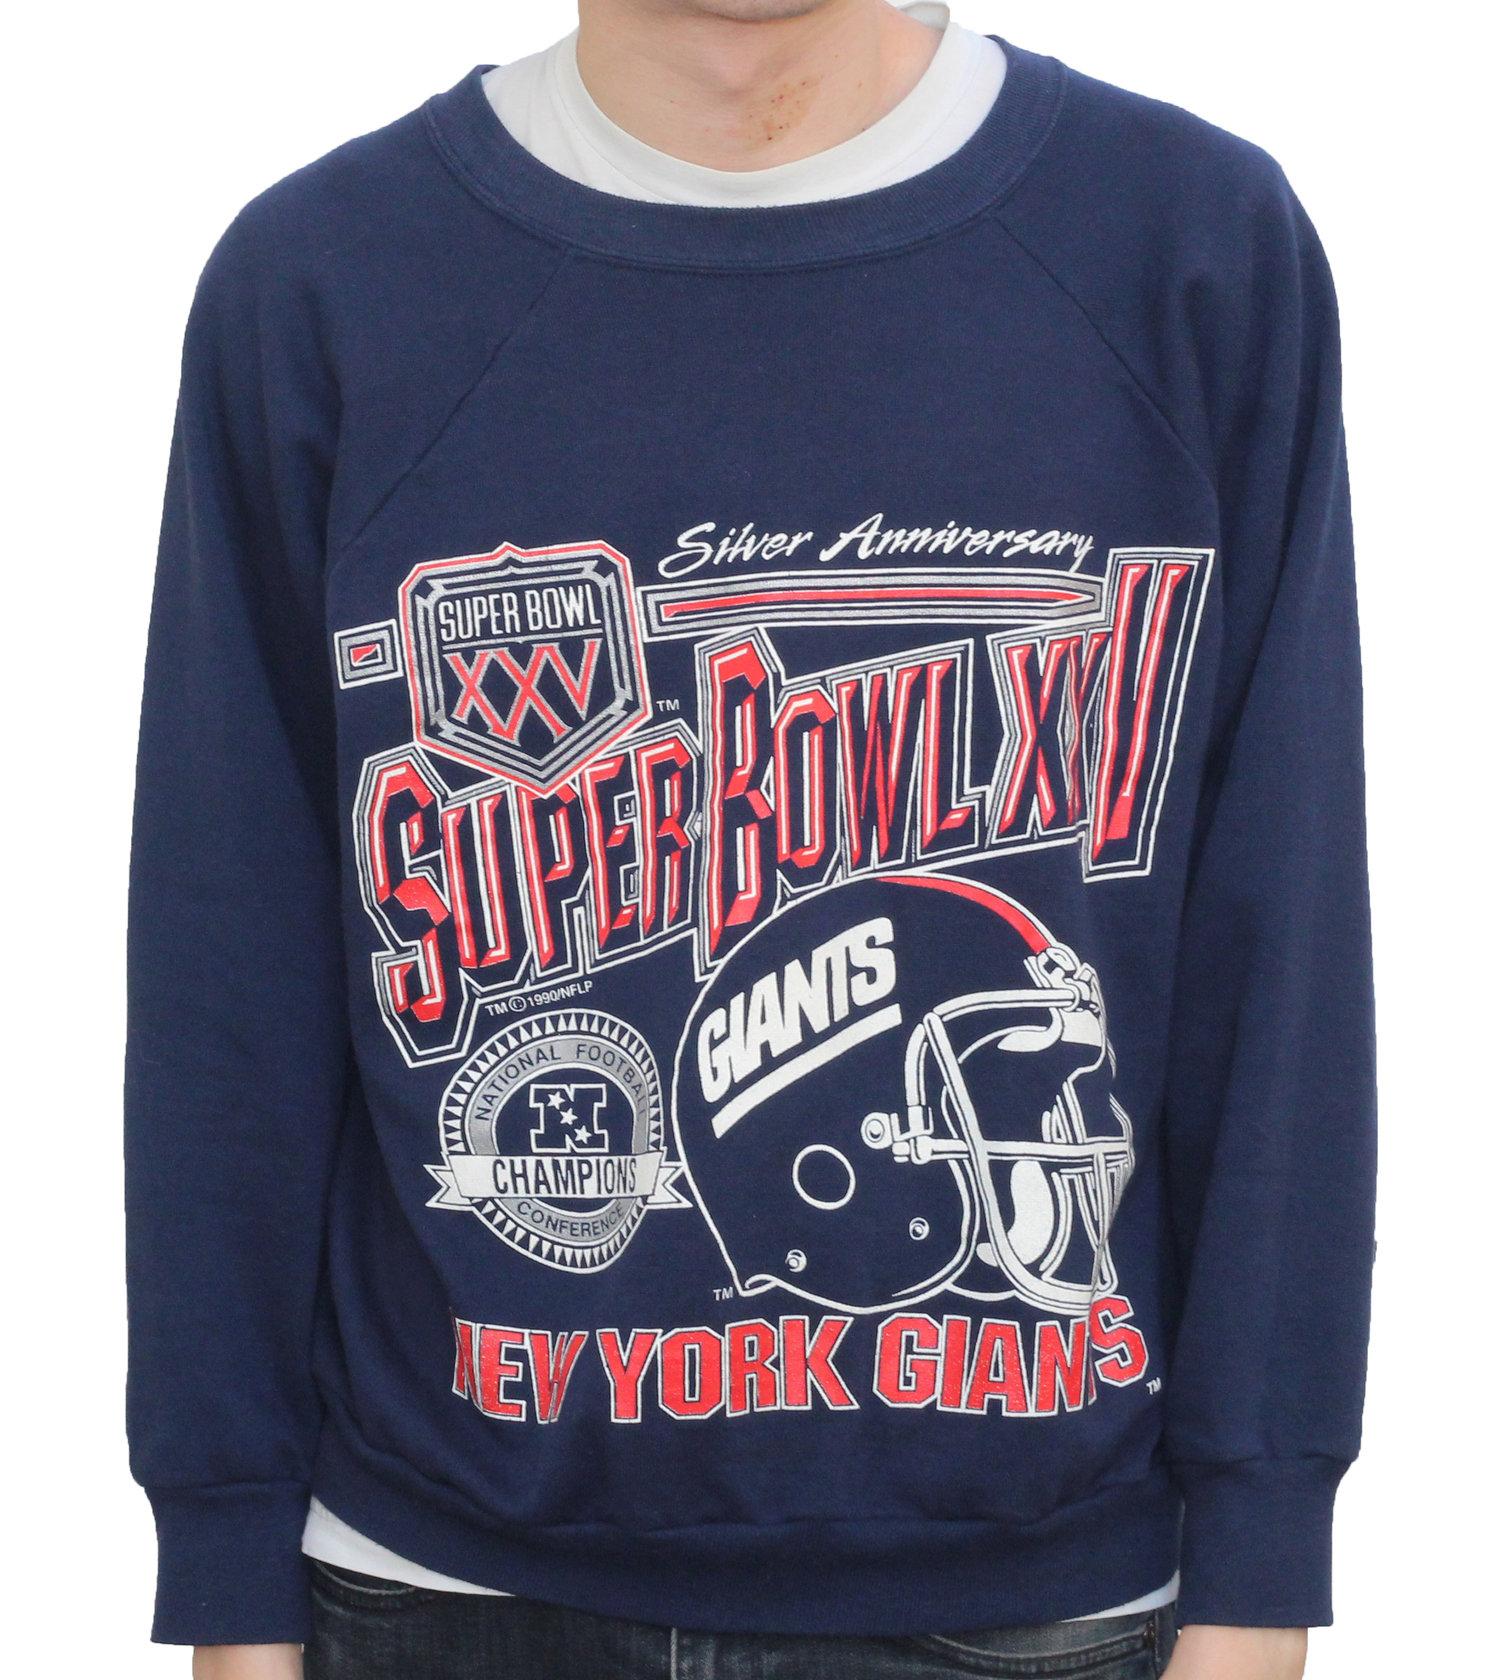 887790ba2 Vintage Logo 7 New York Giants Super Bowl XXV Sweatshirt (Size L Fits  Smaller) — Roots